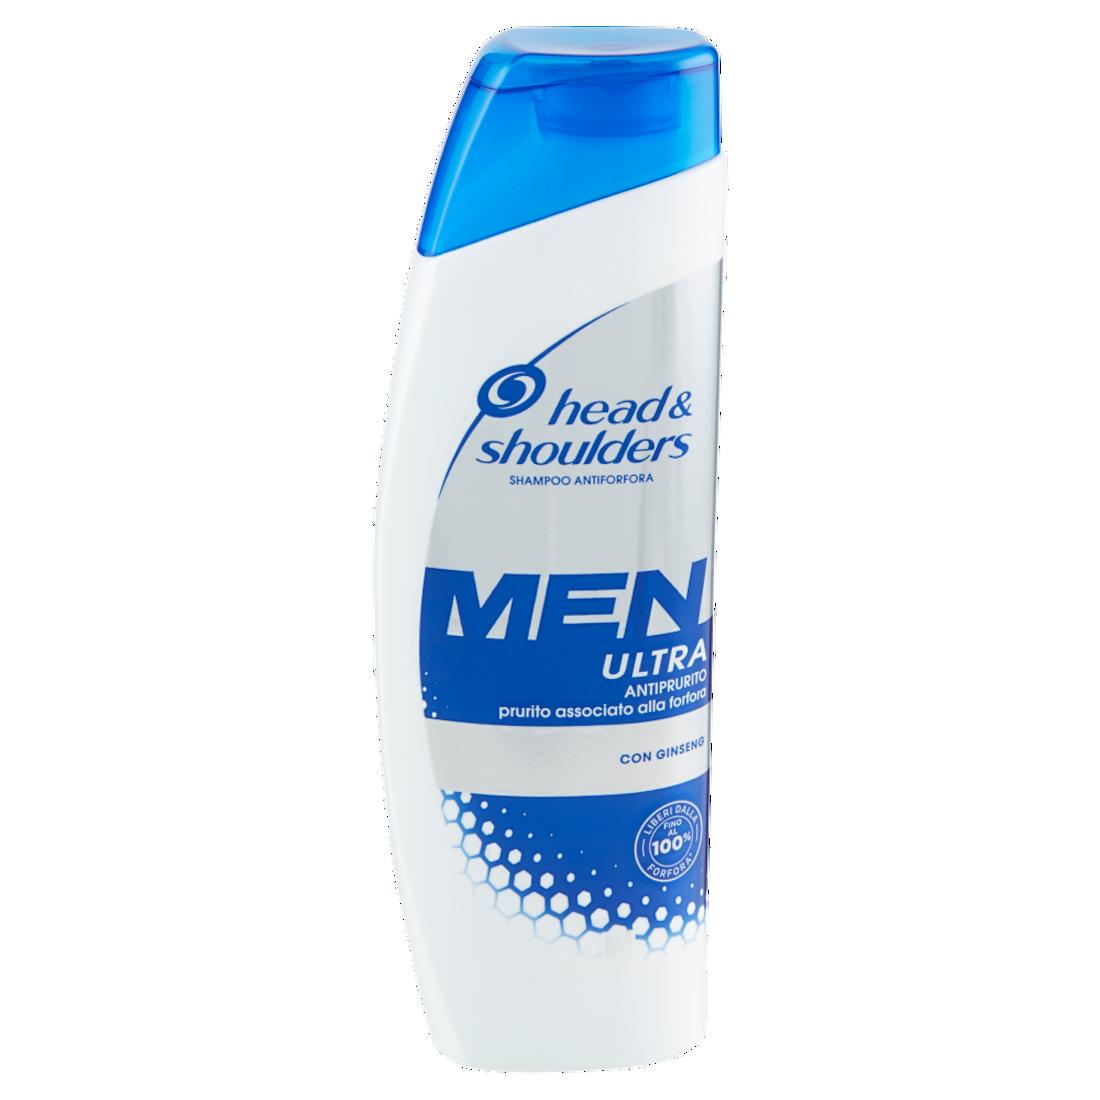 HEAD & SHOULDERS Men Ultra Antiprurito Shampoo Antiforfora 225ml